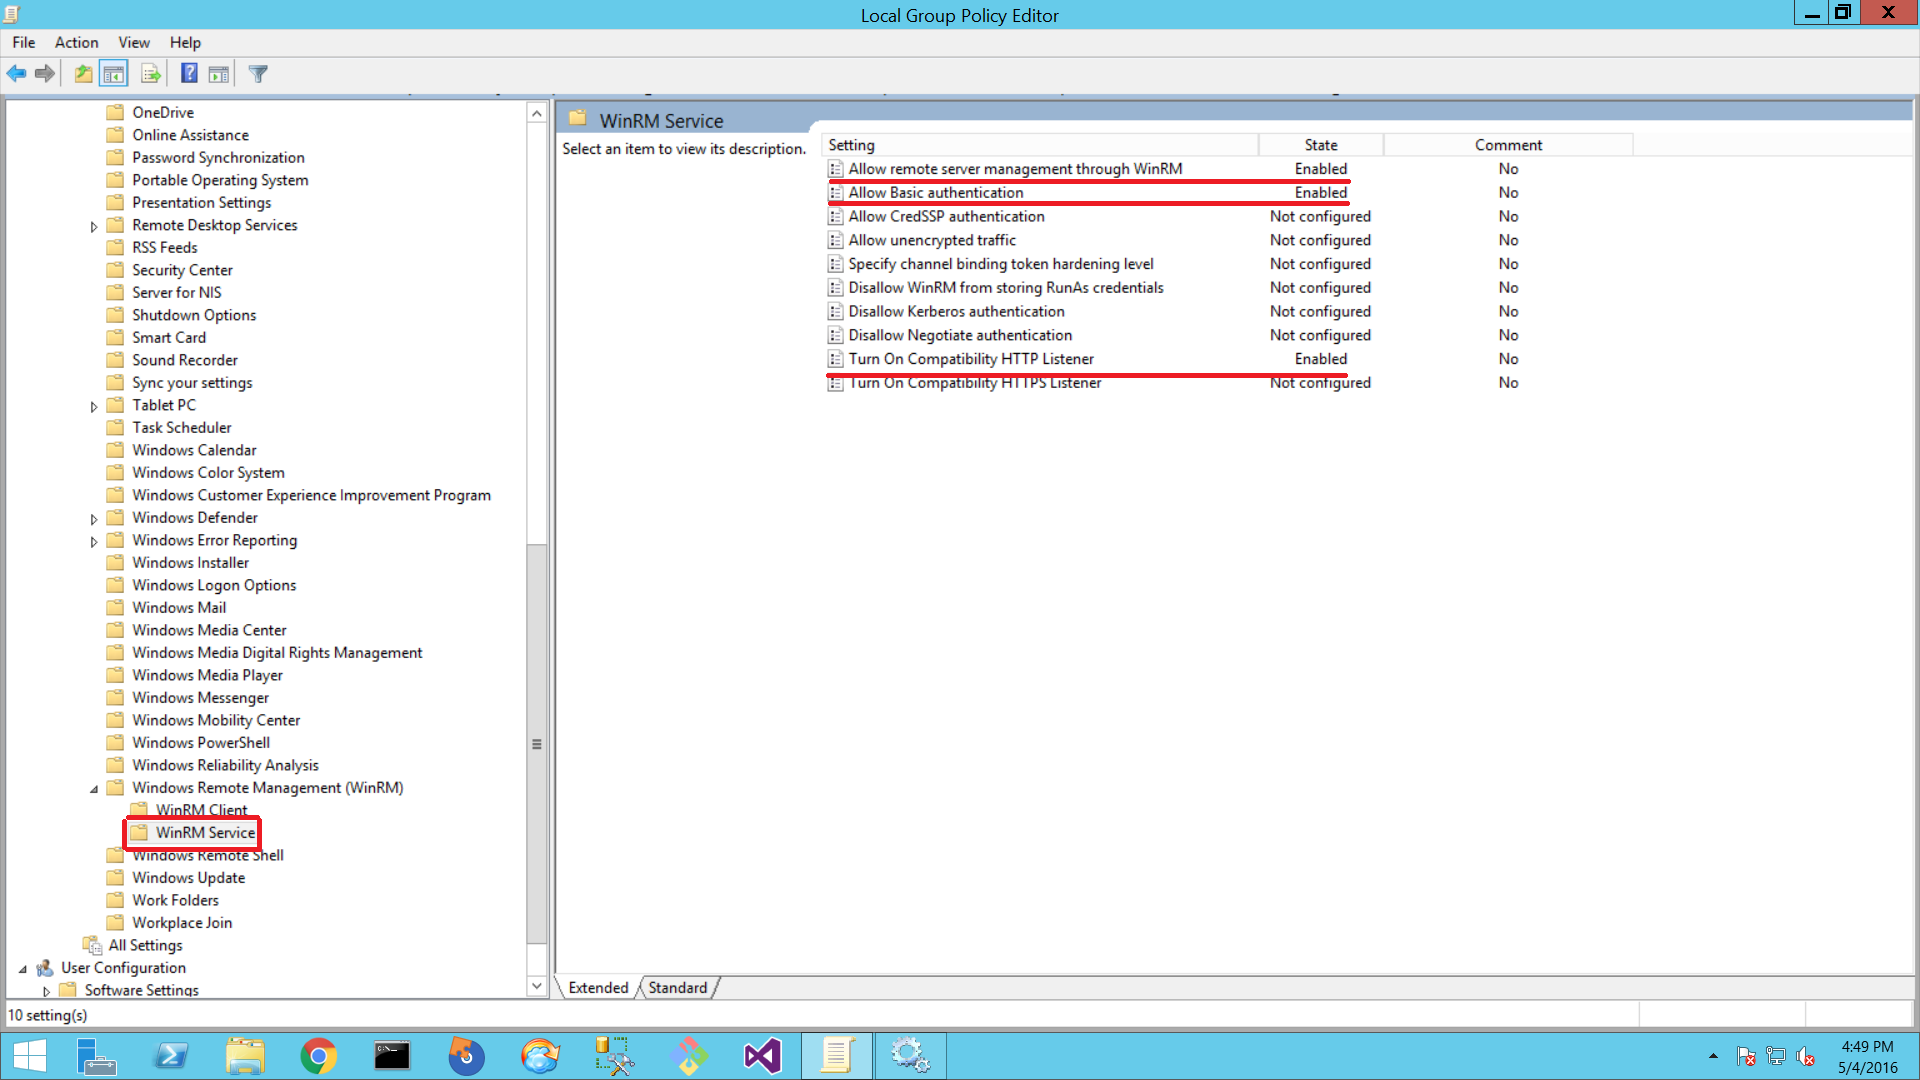 JENKINS-34610] Windows AMI in endless loop - Jenkins JIRA